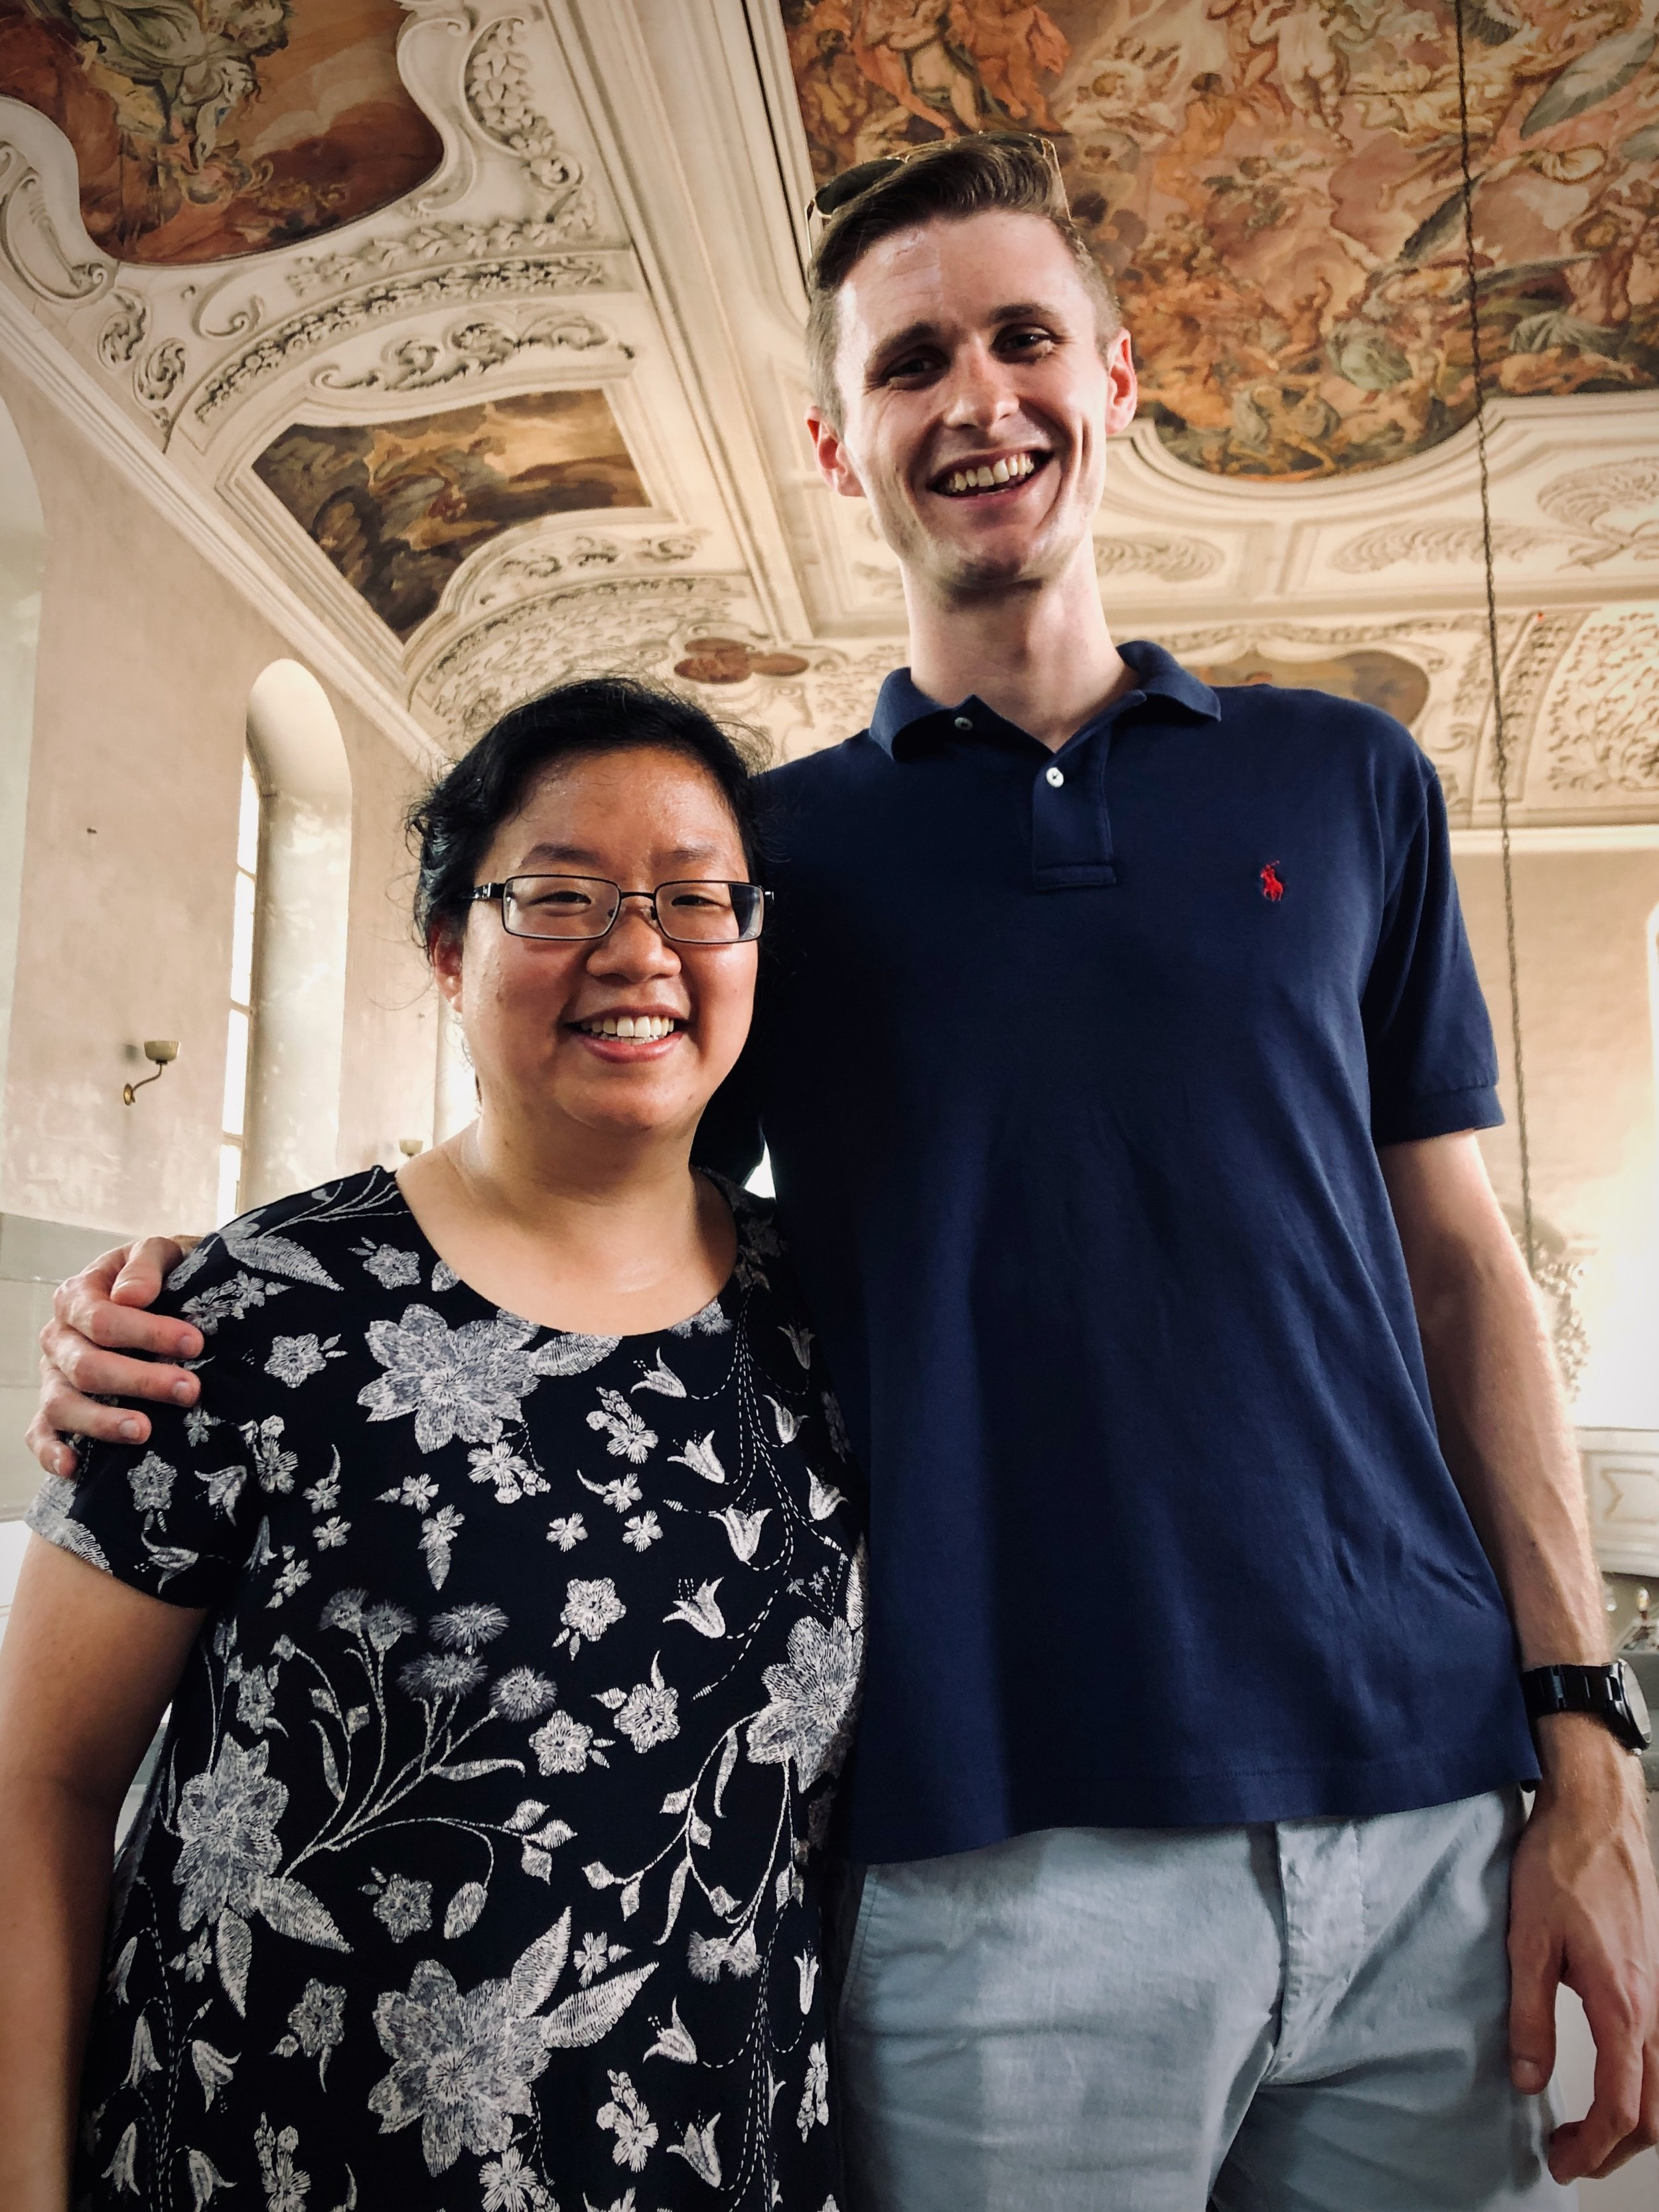 Jennifer Hsiao and Evan Currie at the Marien-Magdalenen-Kirche, Naumburg.